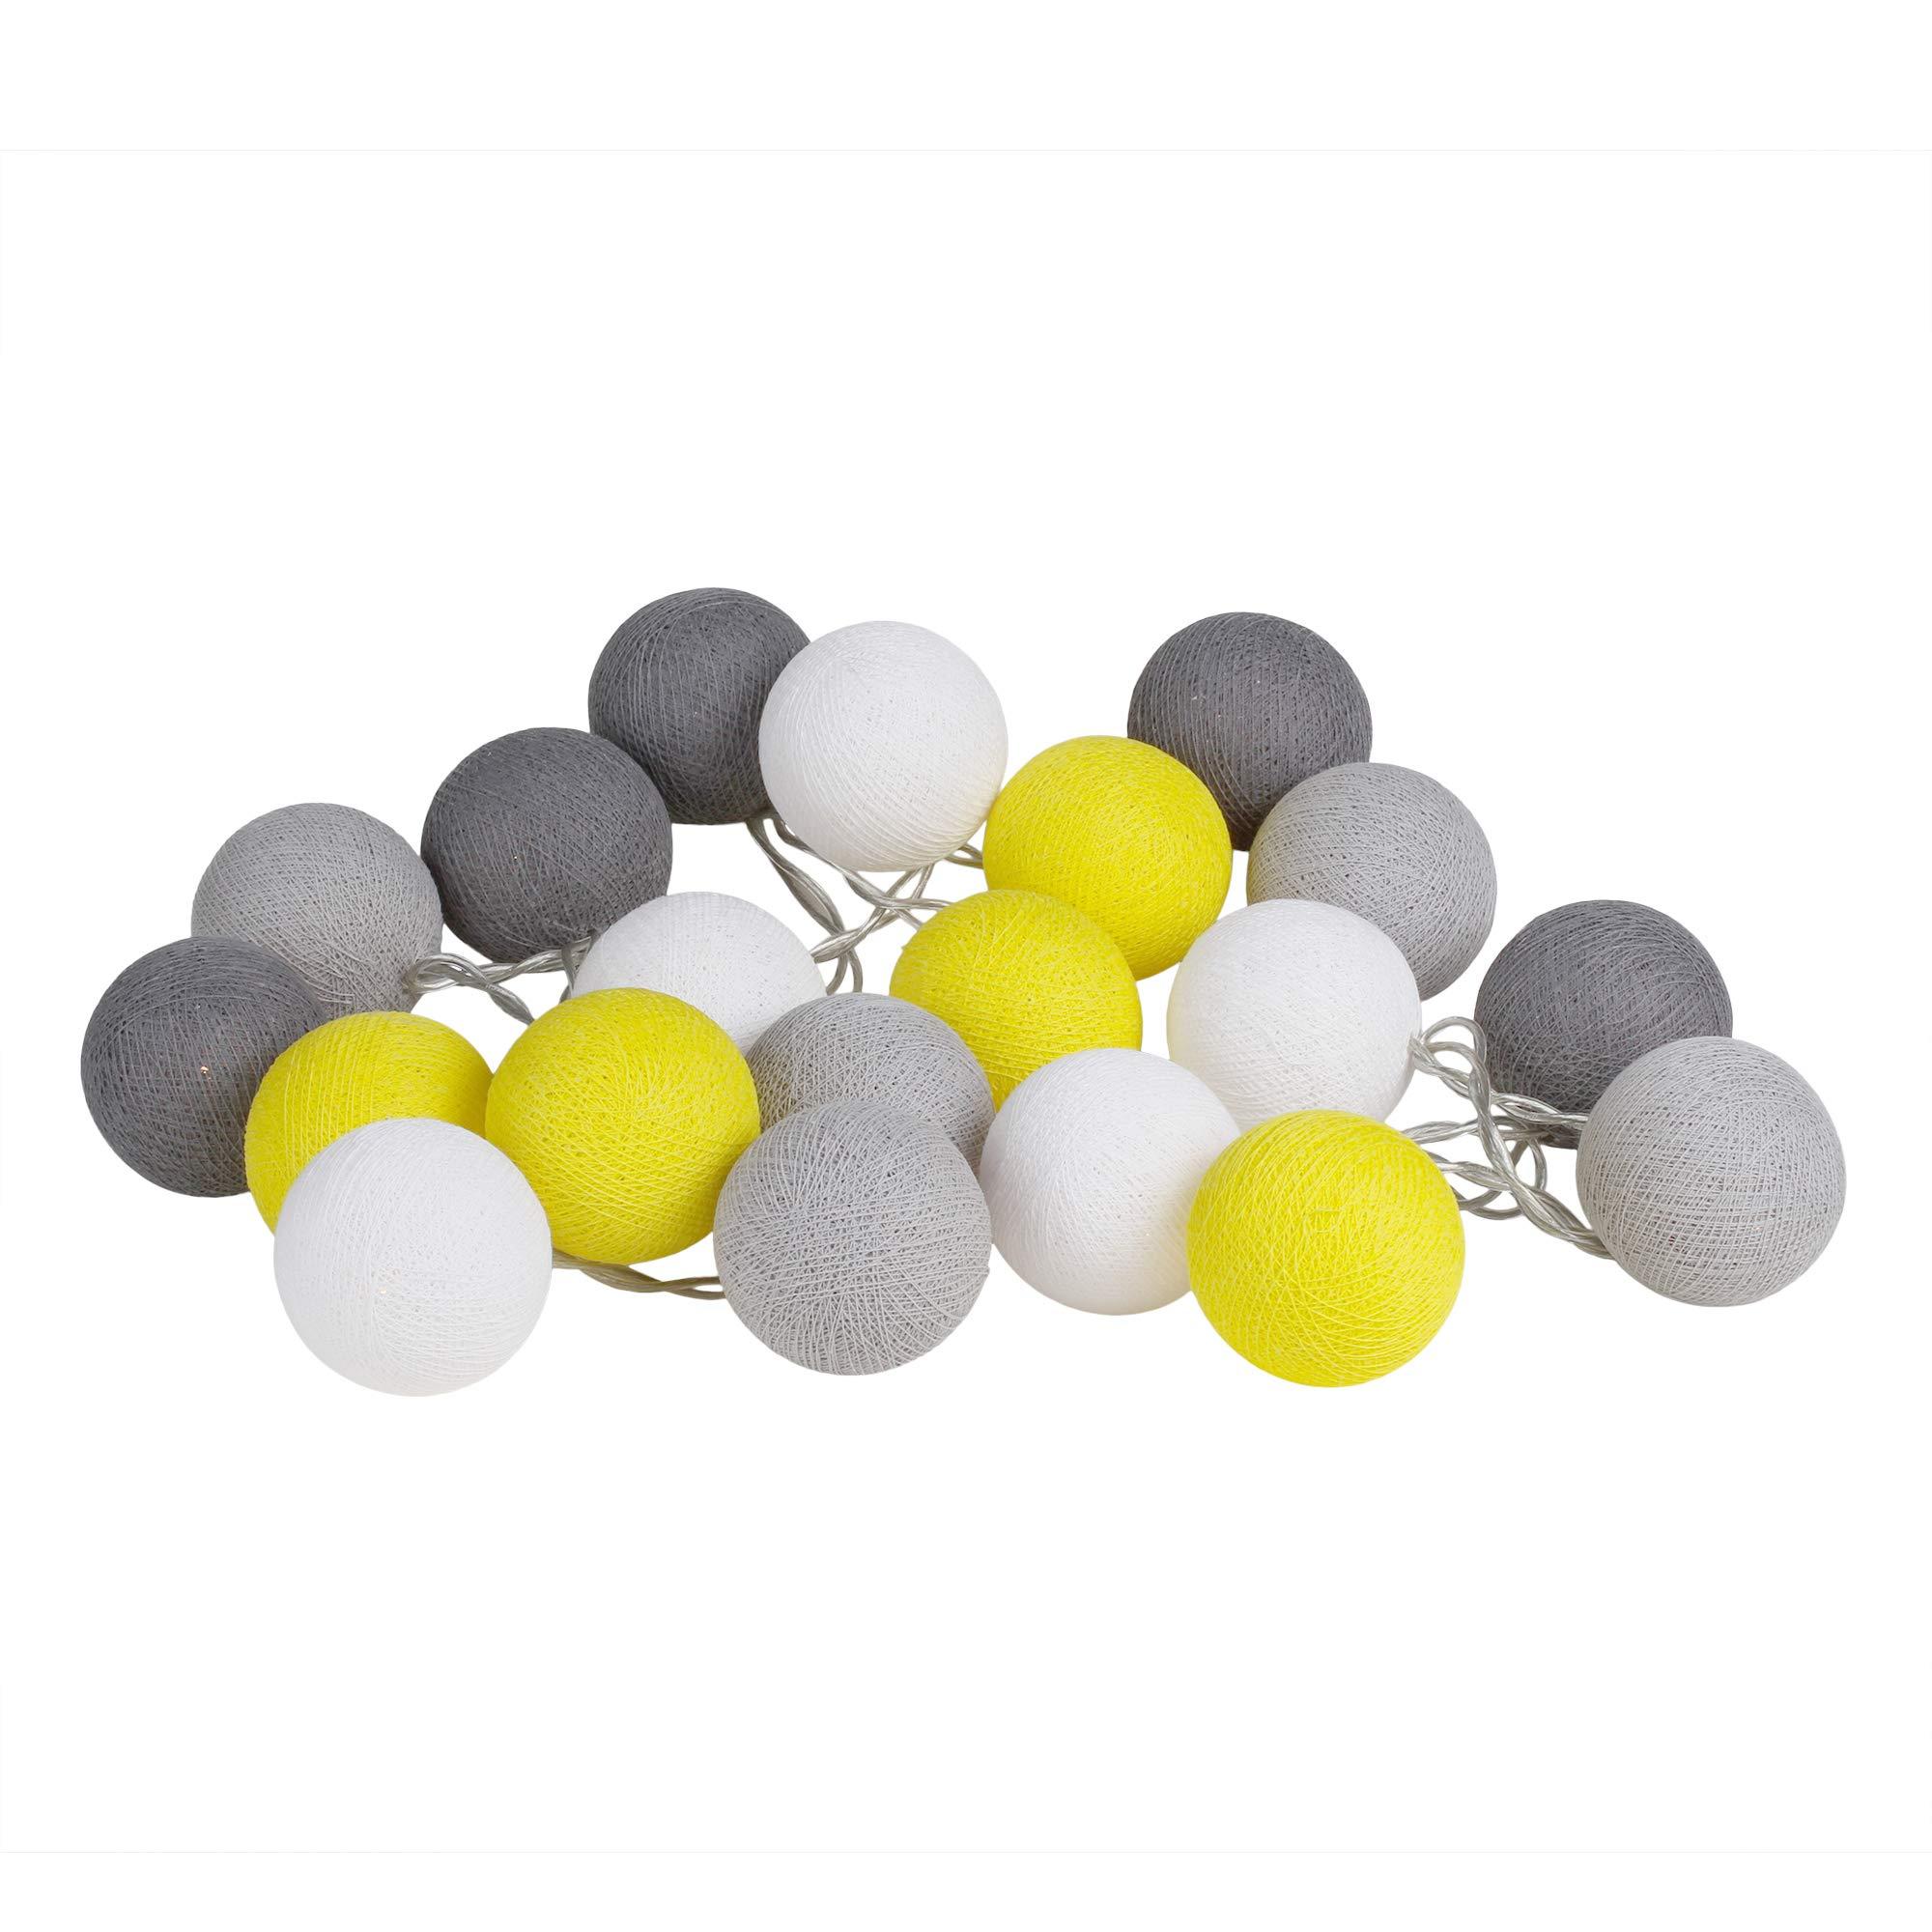 CHAINUPON 20 Cotton Ball String Fairy Lights Kid Bedroom,Home,Decor,Boys Girls Plug in Lights (Yellow Gray)